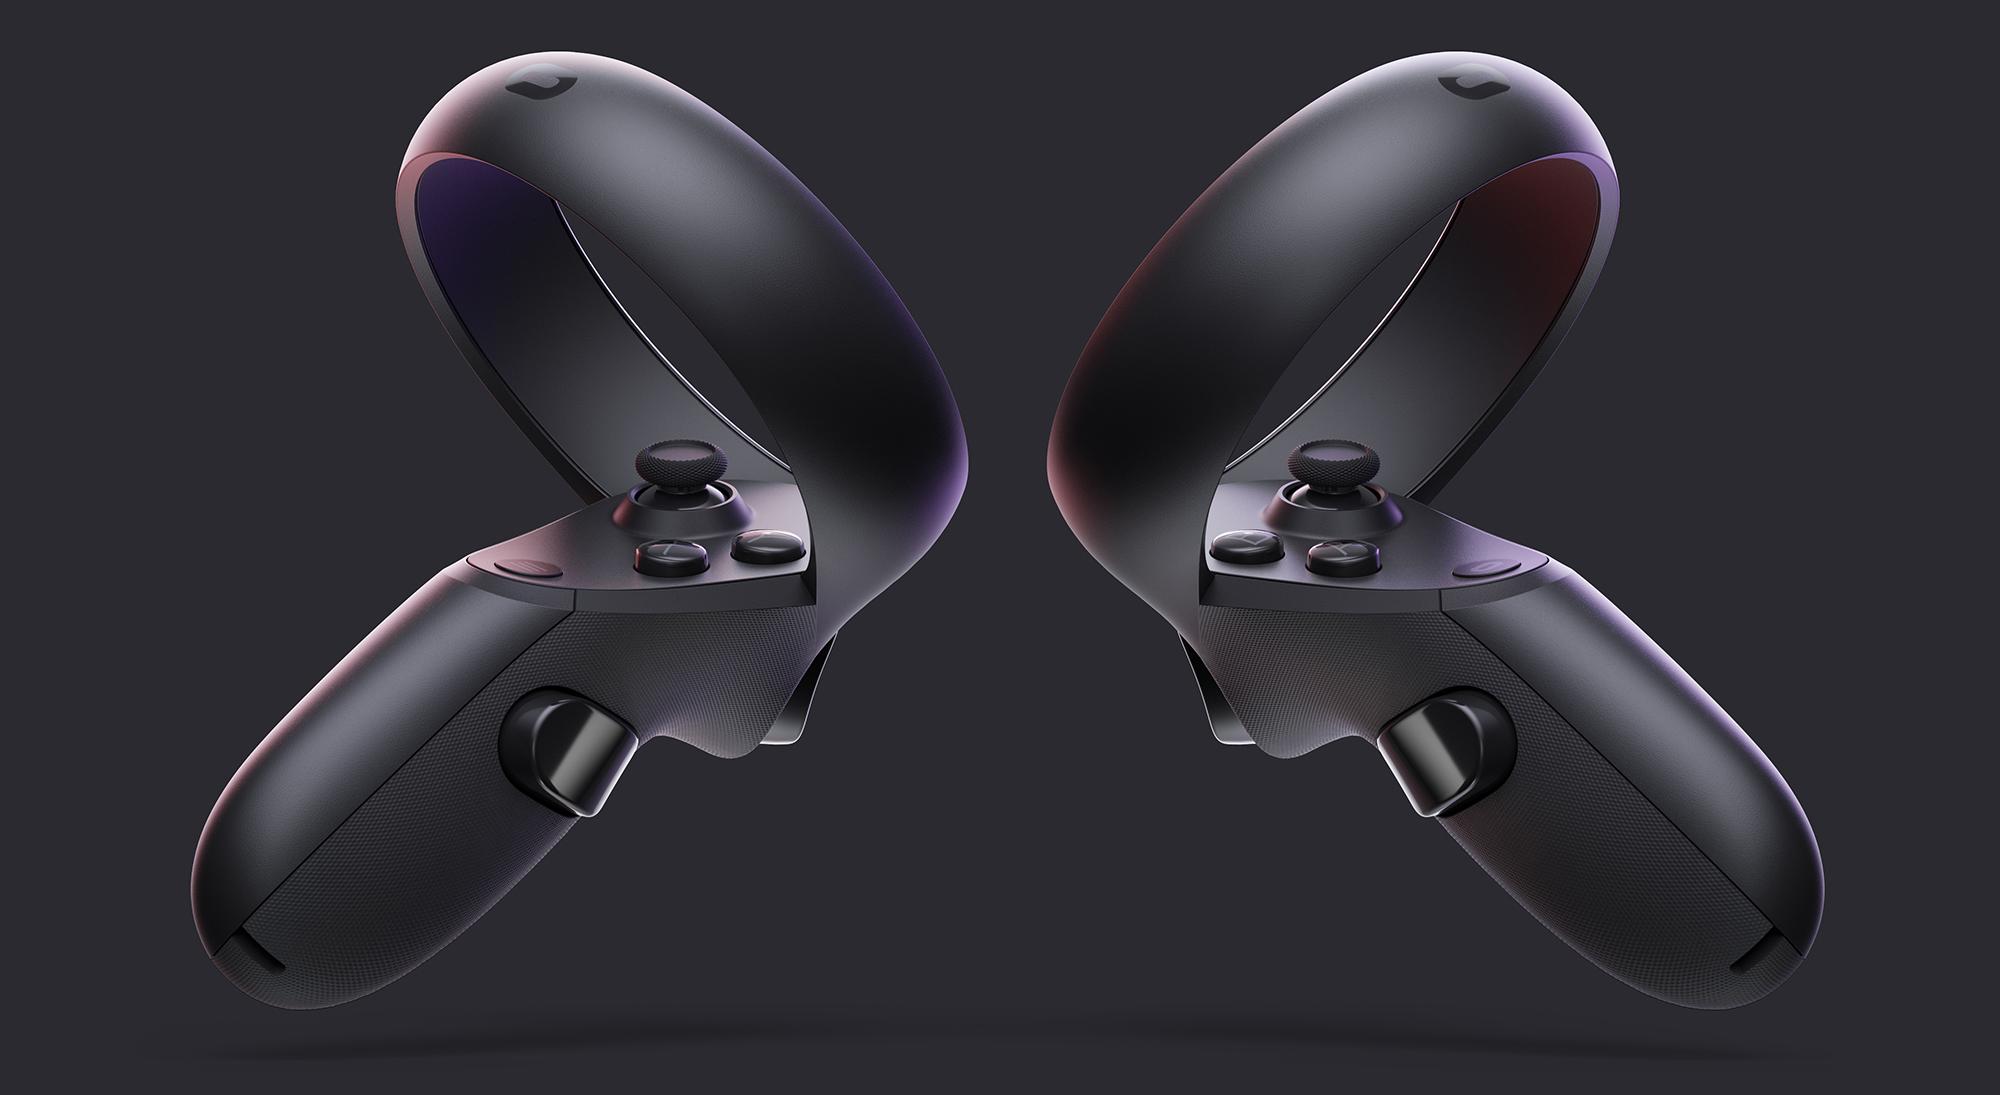 Oculus Quest Announced: A 6DoF Standalone VR Headset